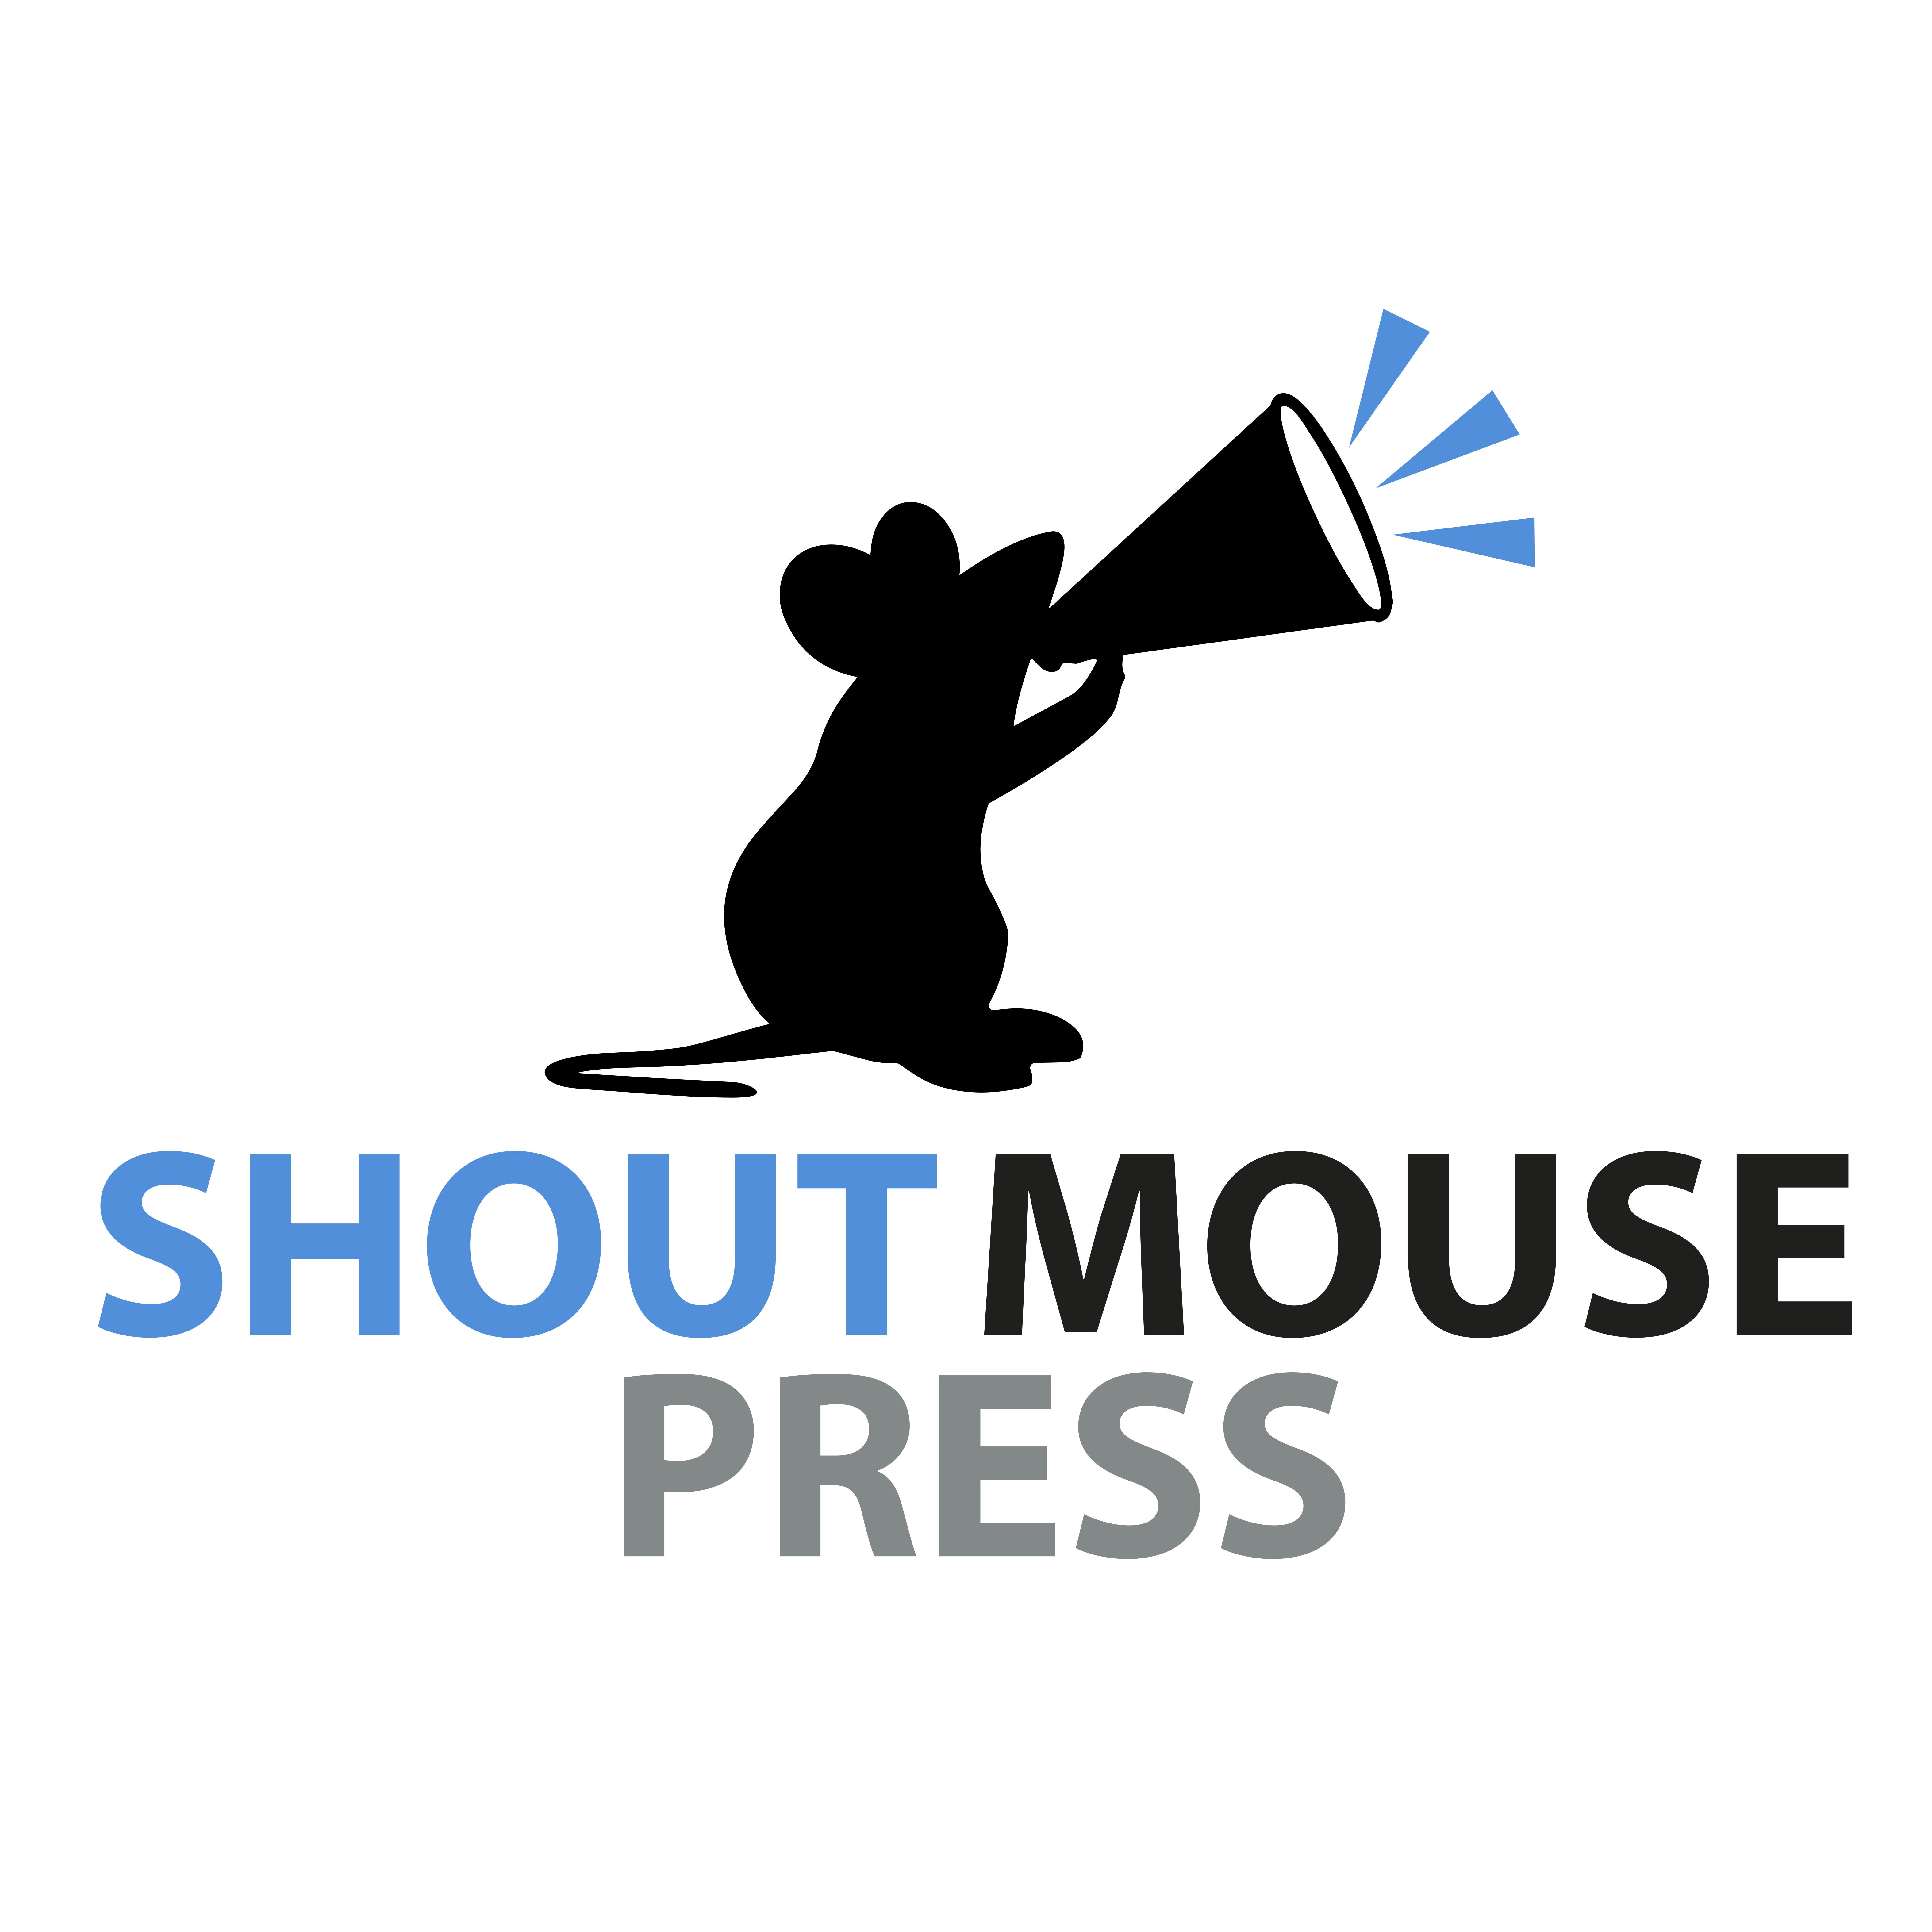 Shout Mouse Press